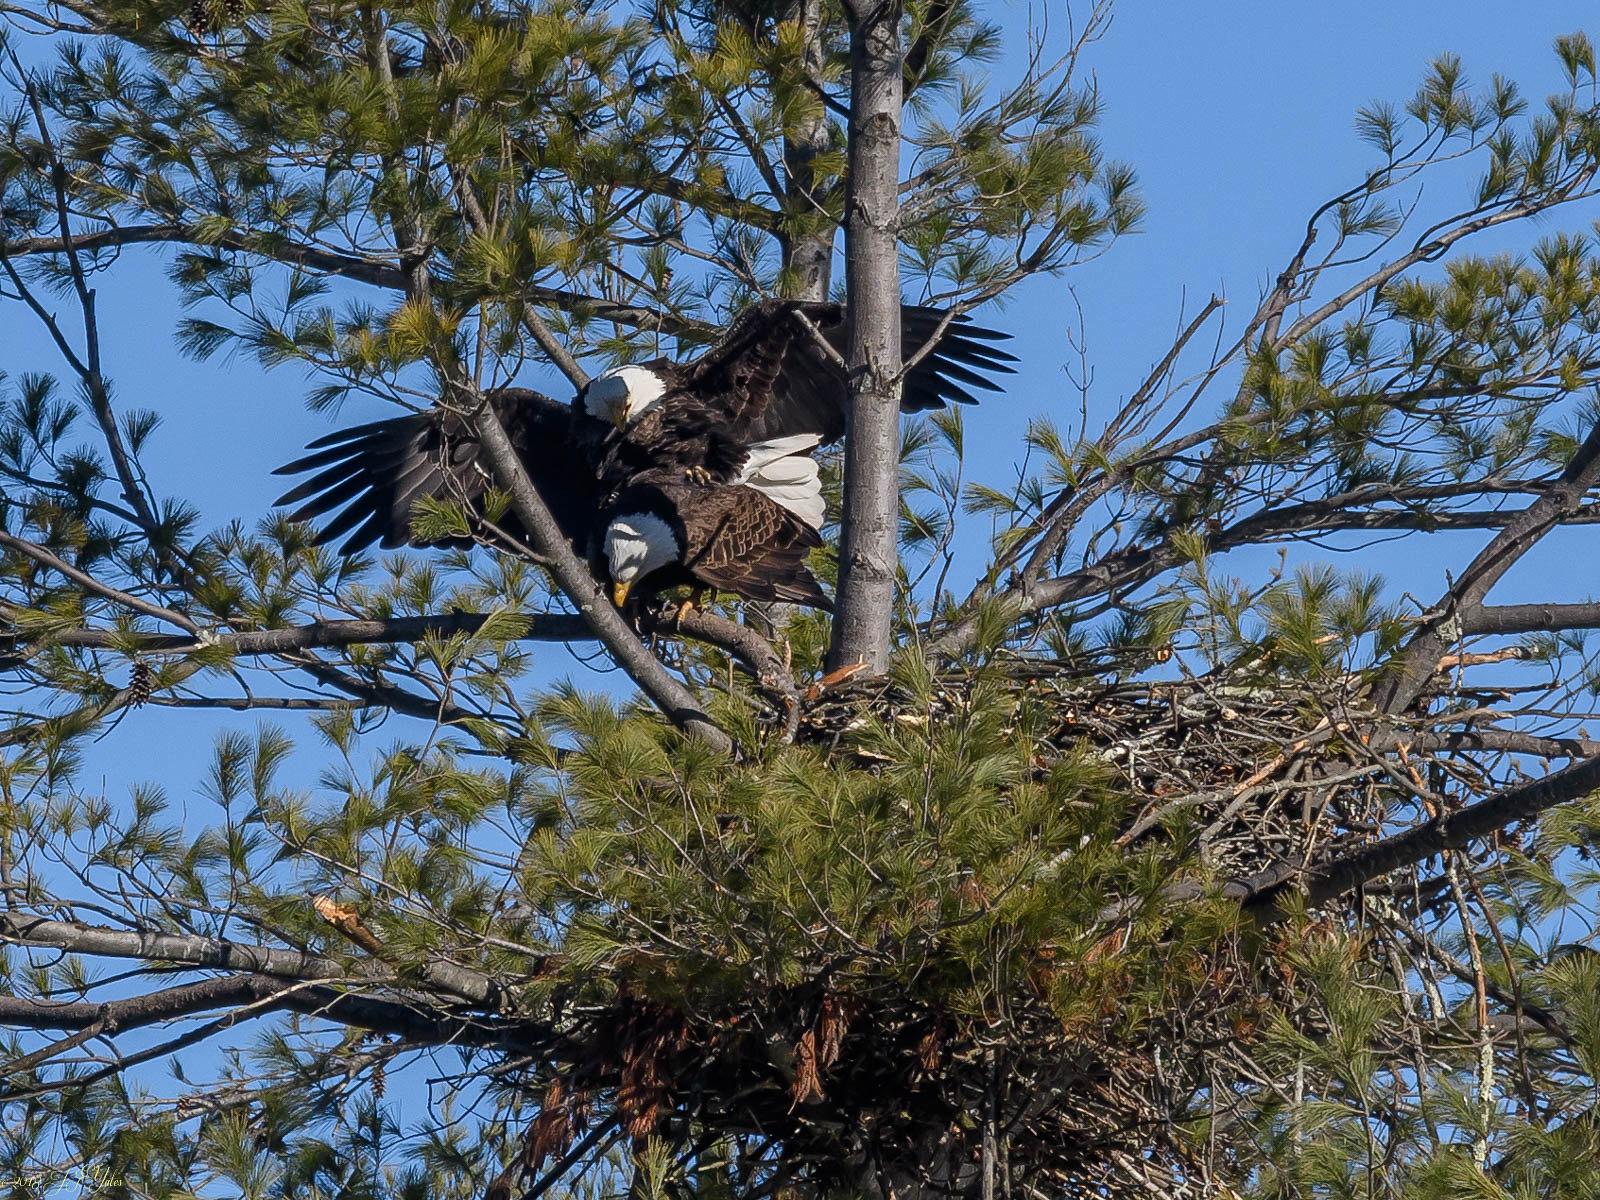 Bald Eagles mating